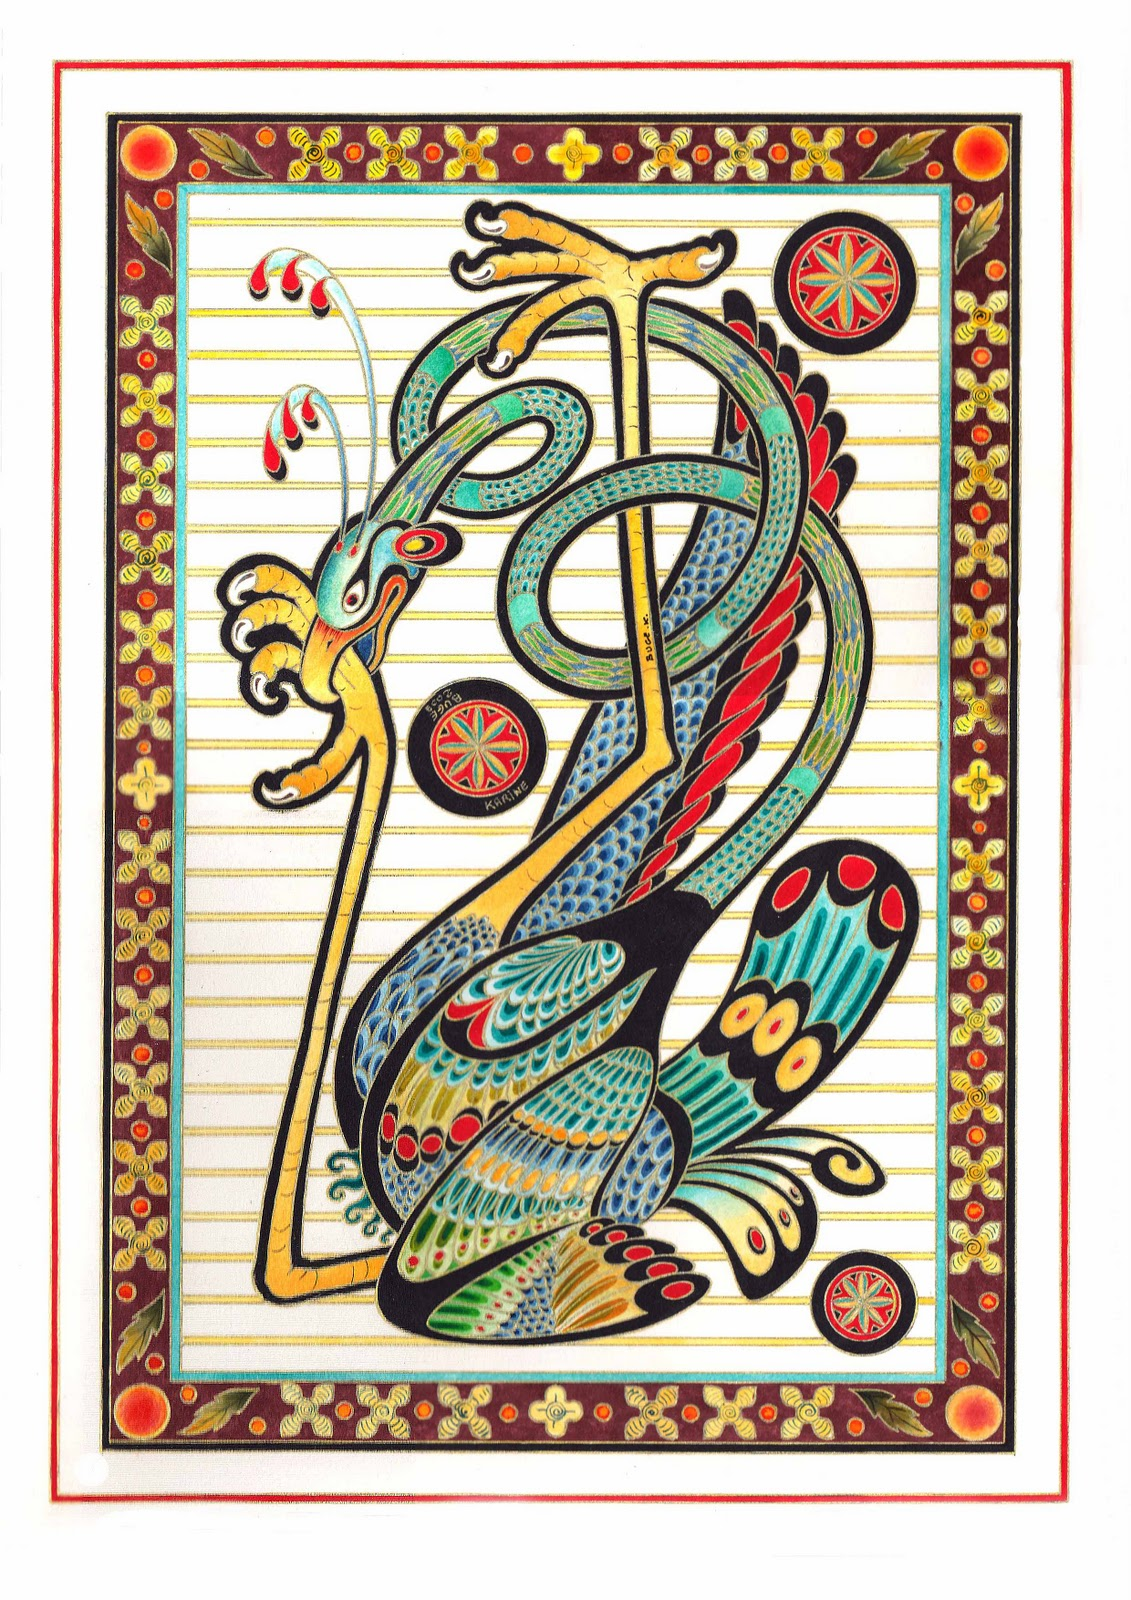 karine buge  illustrations entrelacs et papillons